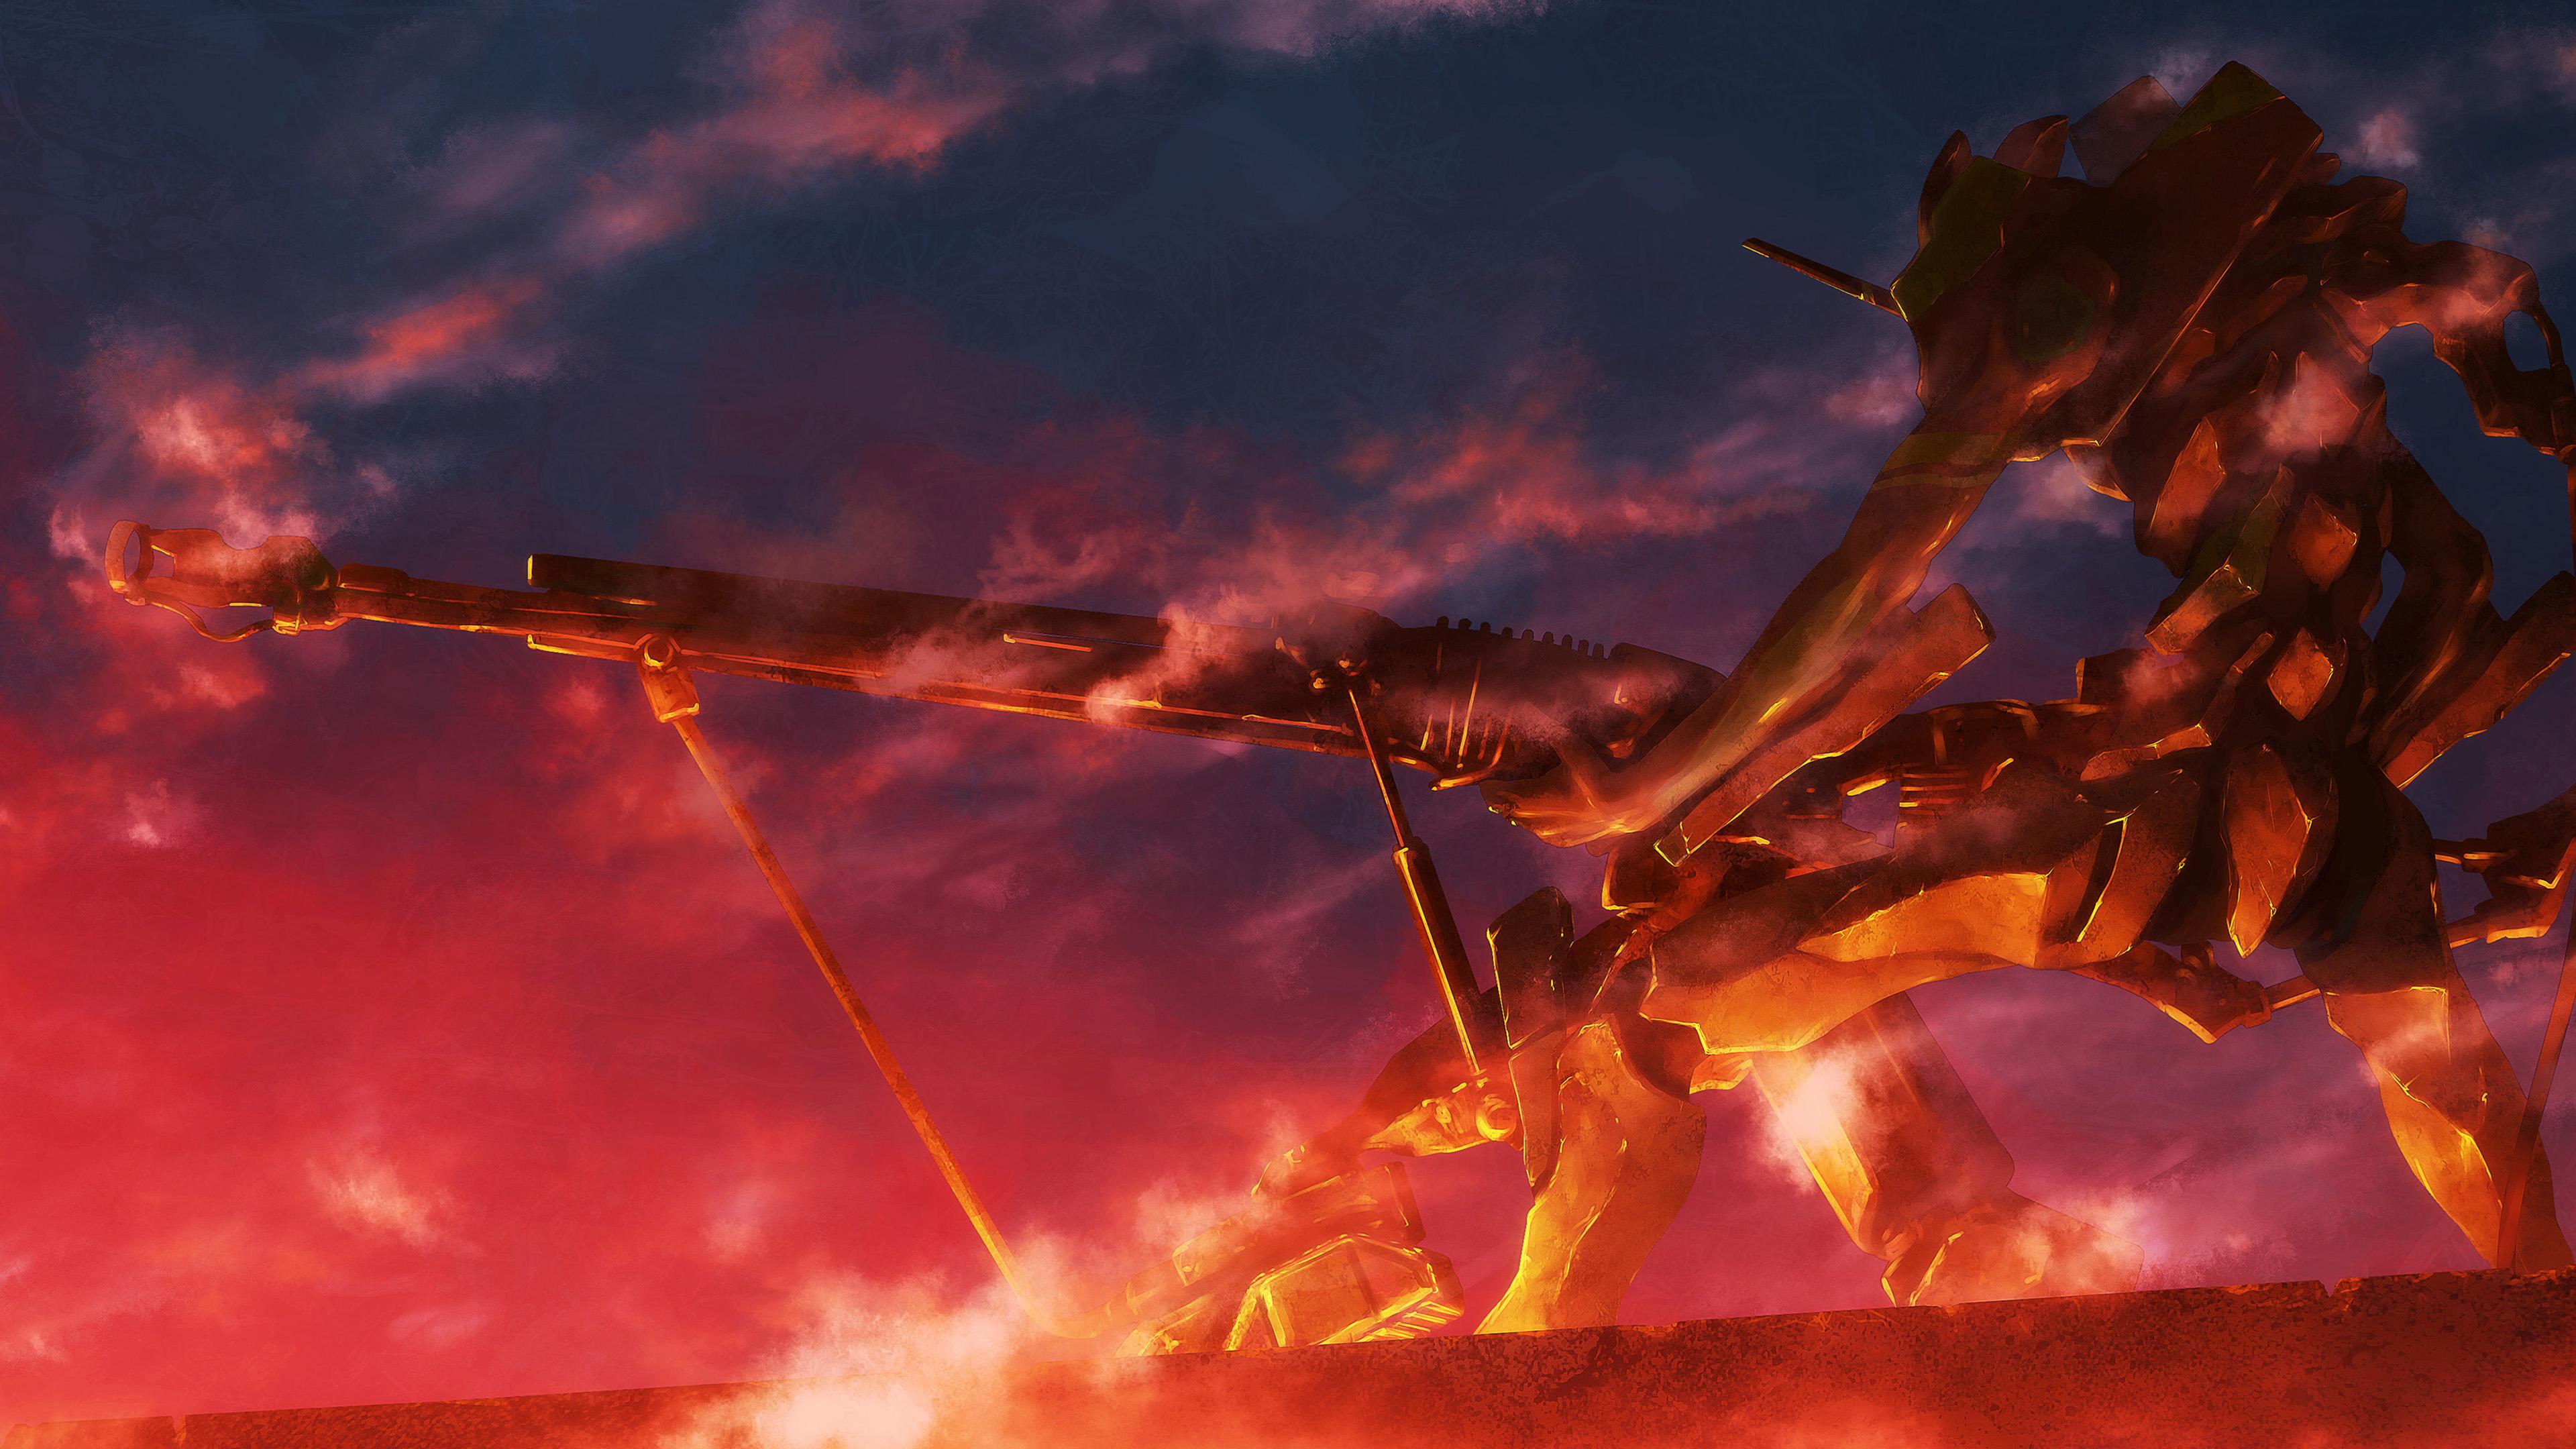 Neon Genesis Evangelion 4k Ultra HD Wallpaper | Background ...